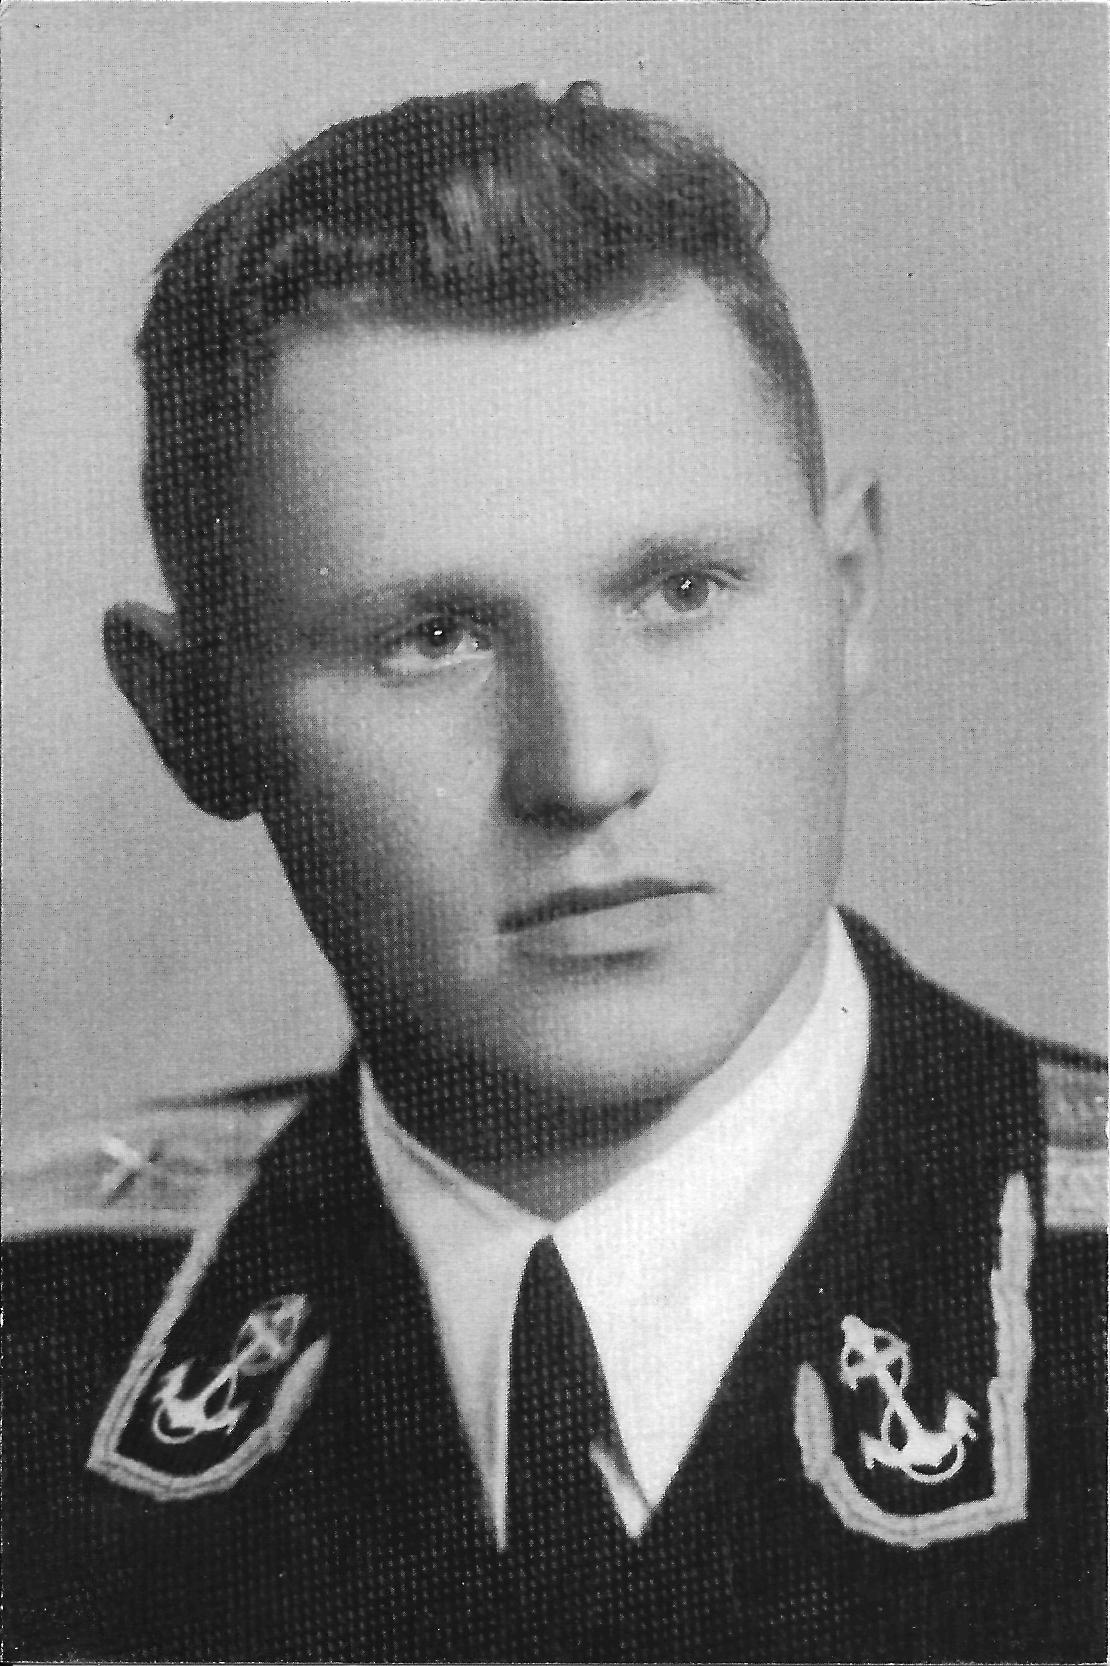 Кудрявцев Лев Алексеевич